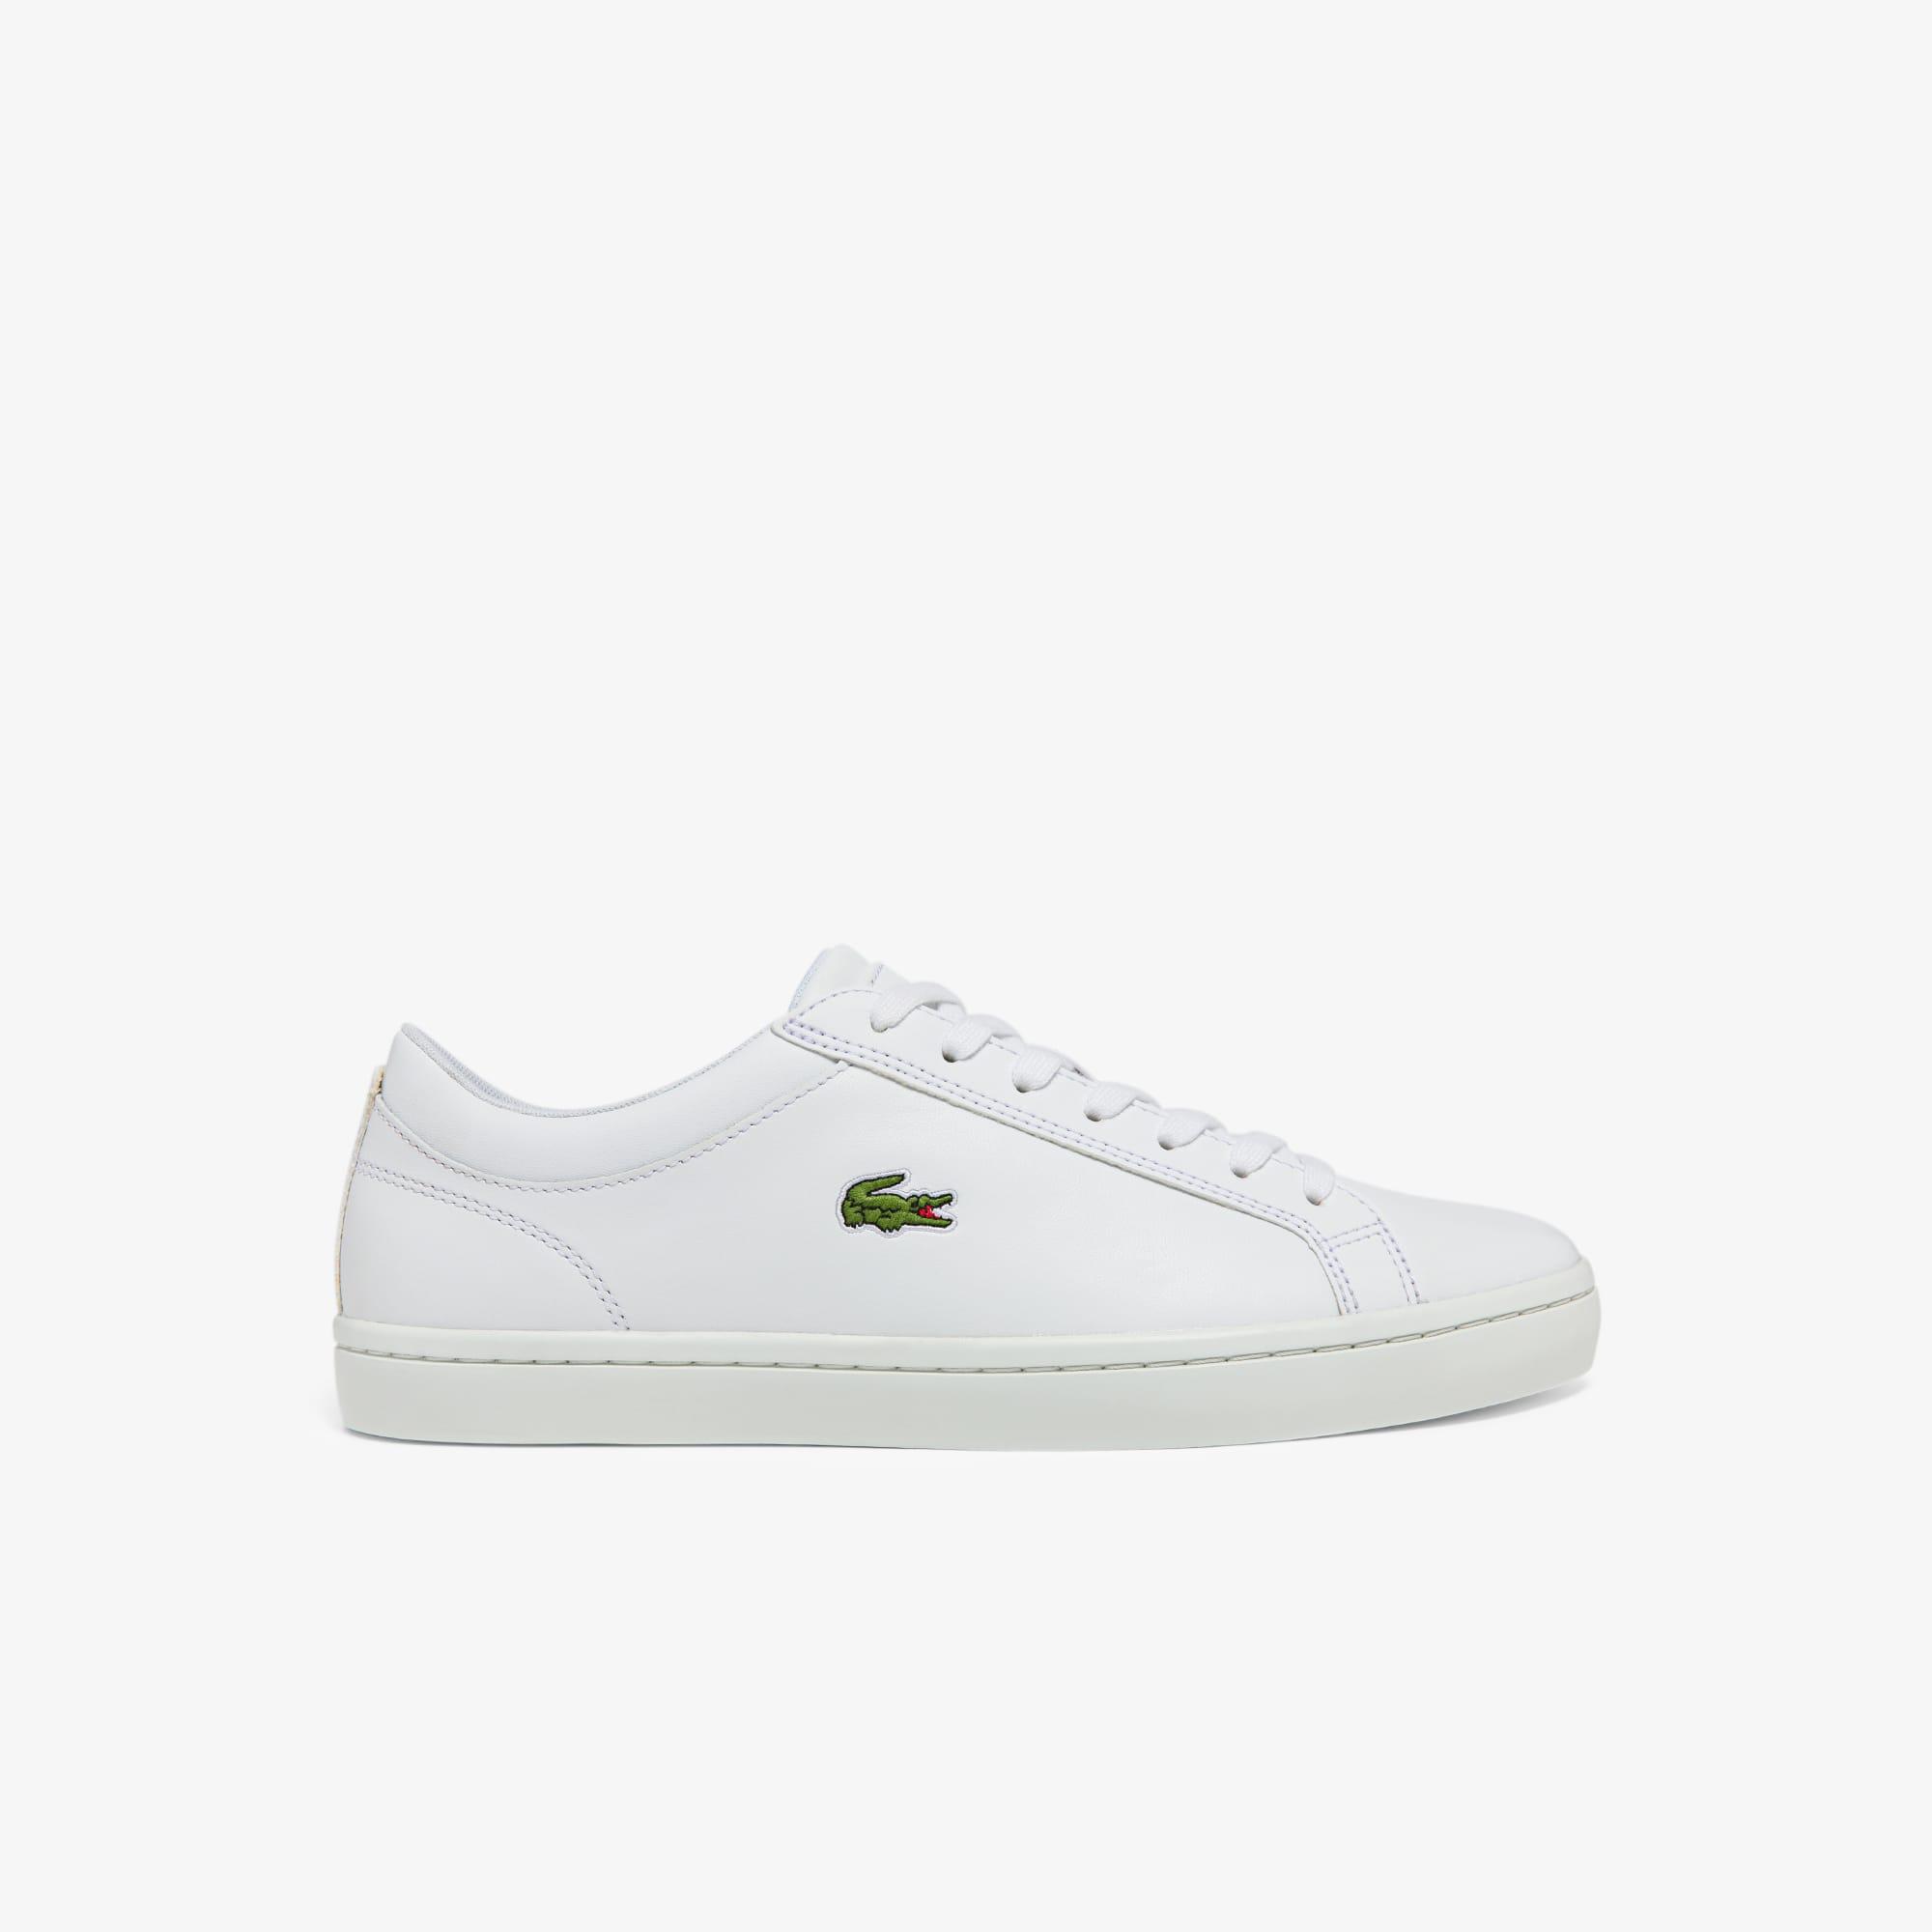 057aad5401c79 Homme Missouri Chaussures Lacoste La Nicekicks Discount Fashion c5LR3jS4Aq